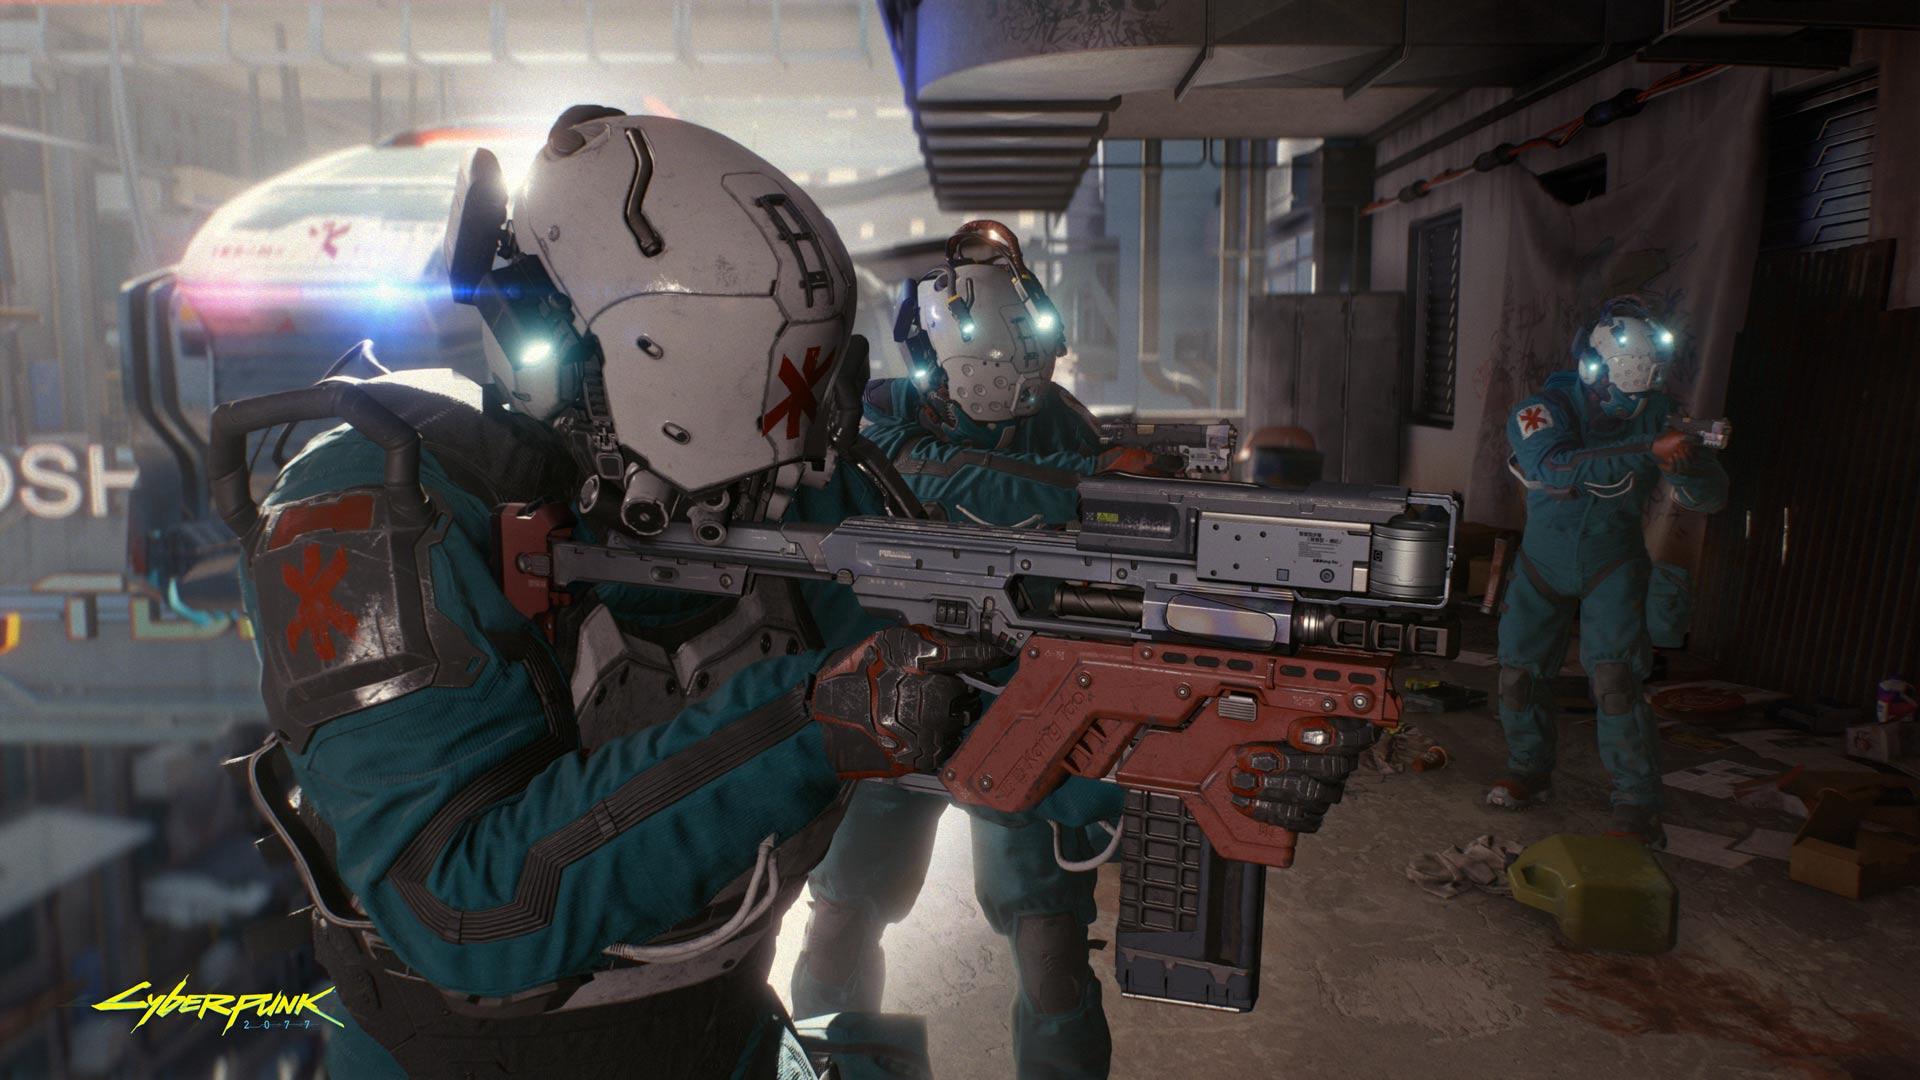 cyberpunk-2077-shot-3